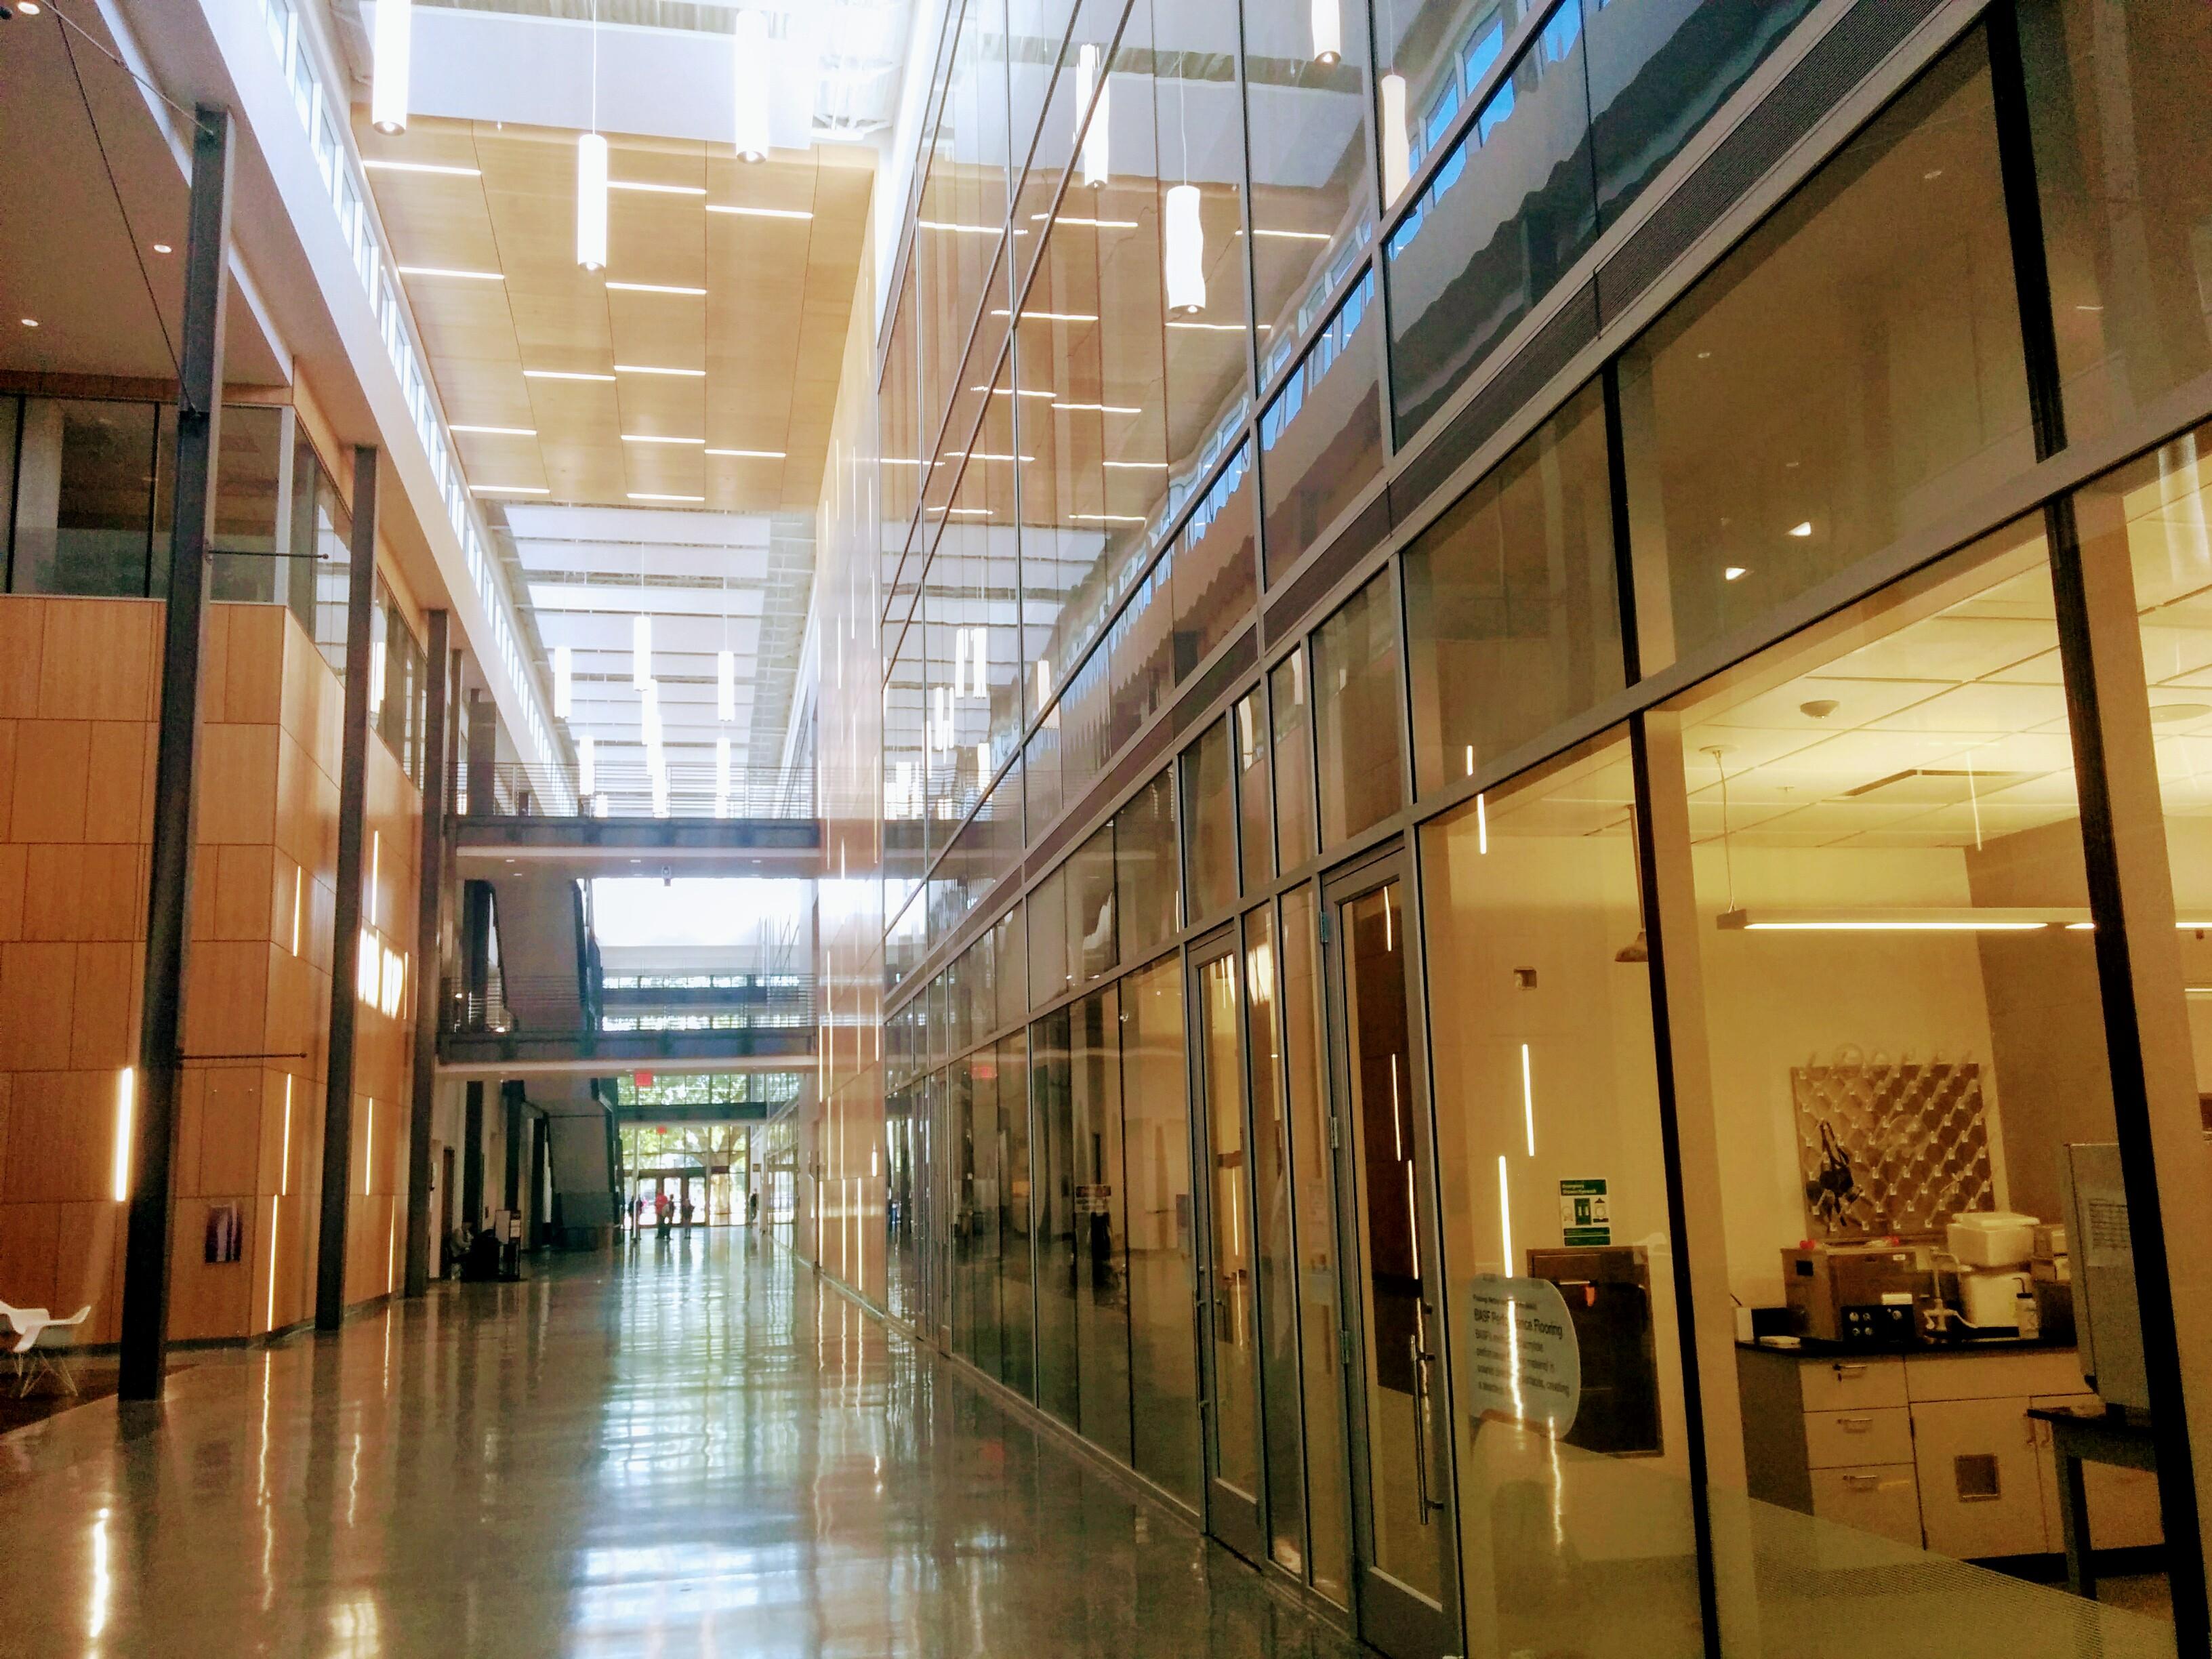 Atrium of light with glass walls